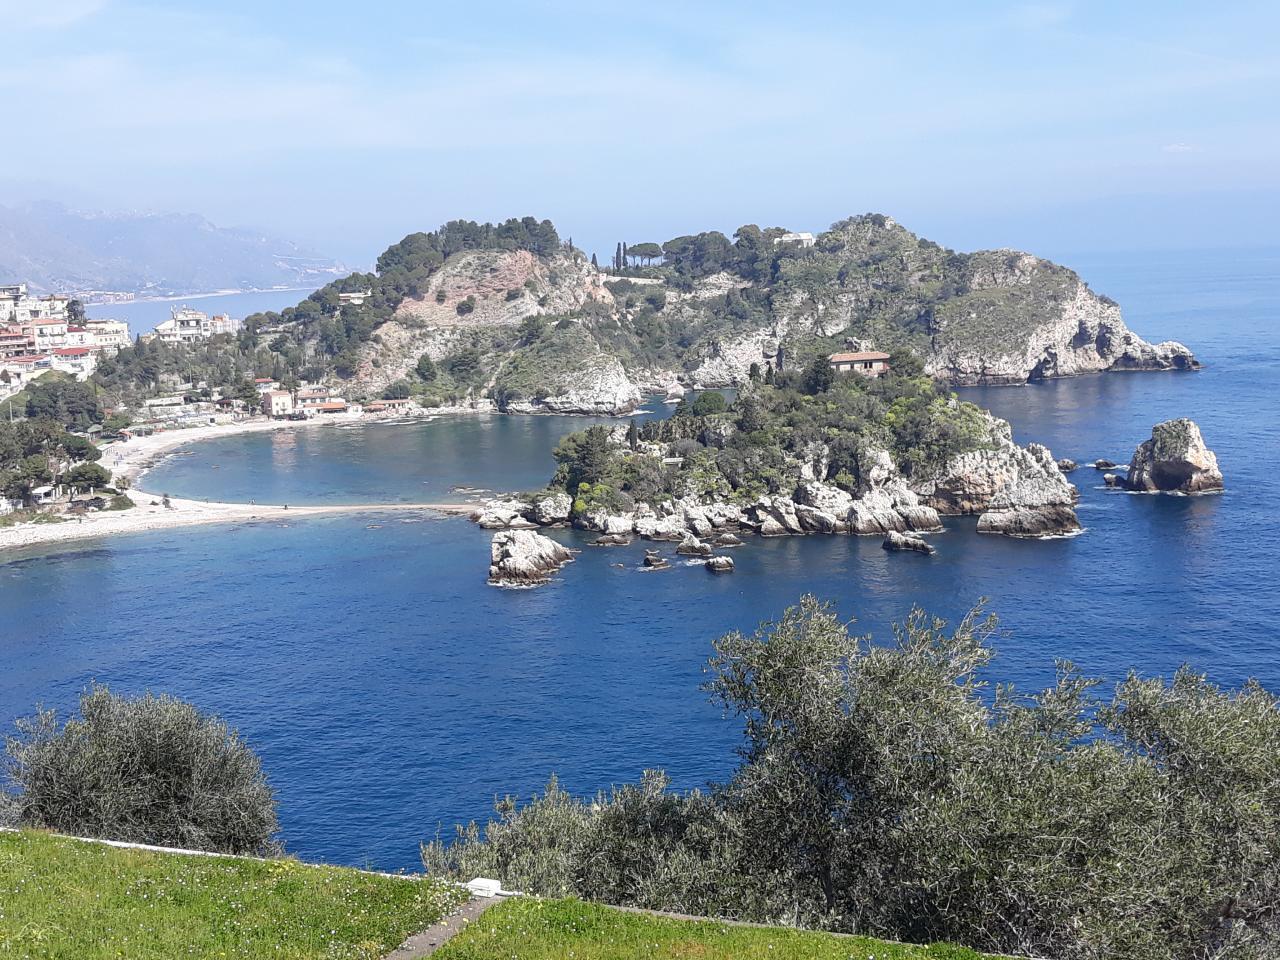 Appartement de vacances MARE - ETNA - TAORMINA (2618228), Mascali, Catania, Sicile, Italie, image 33